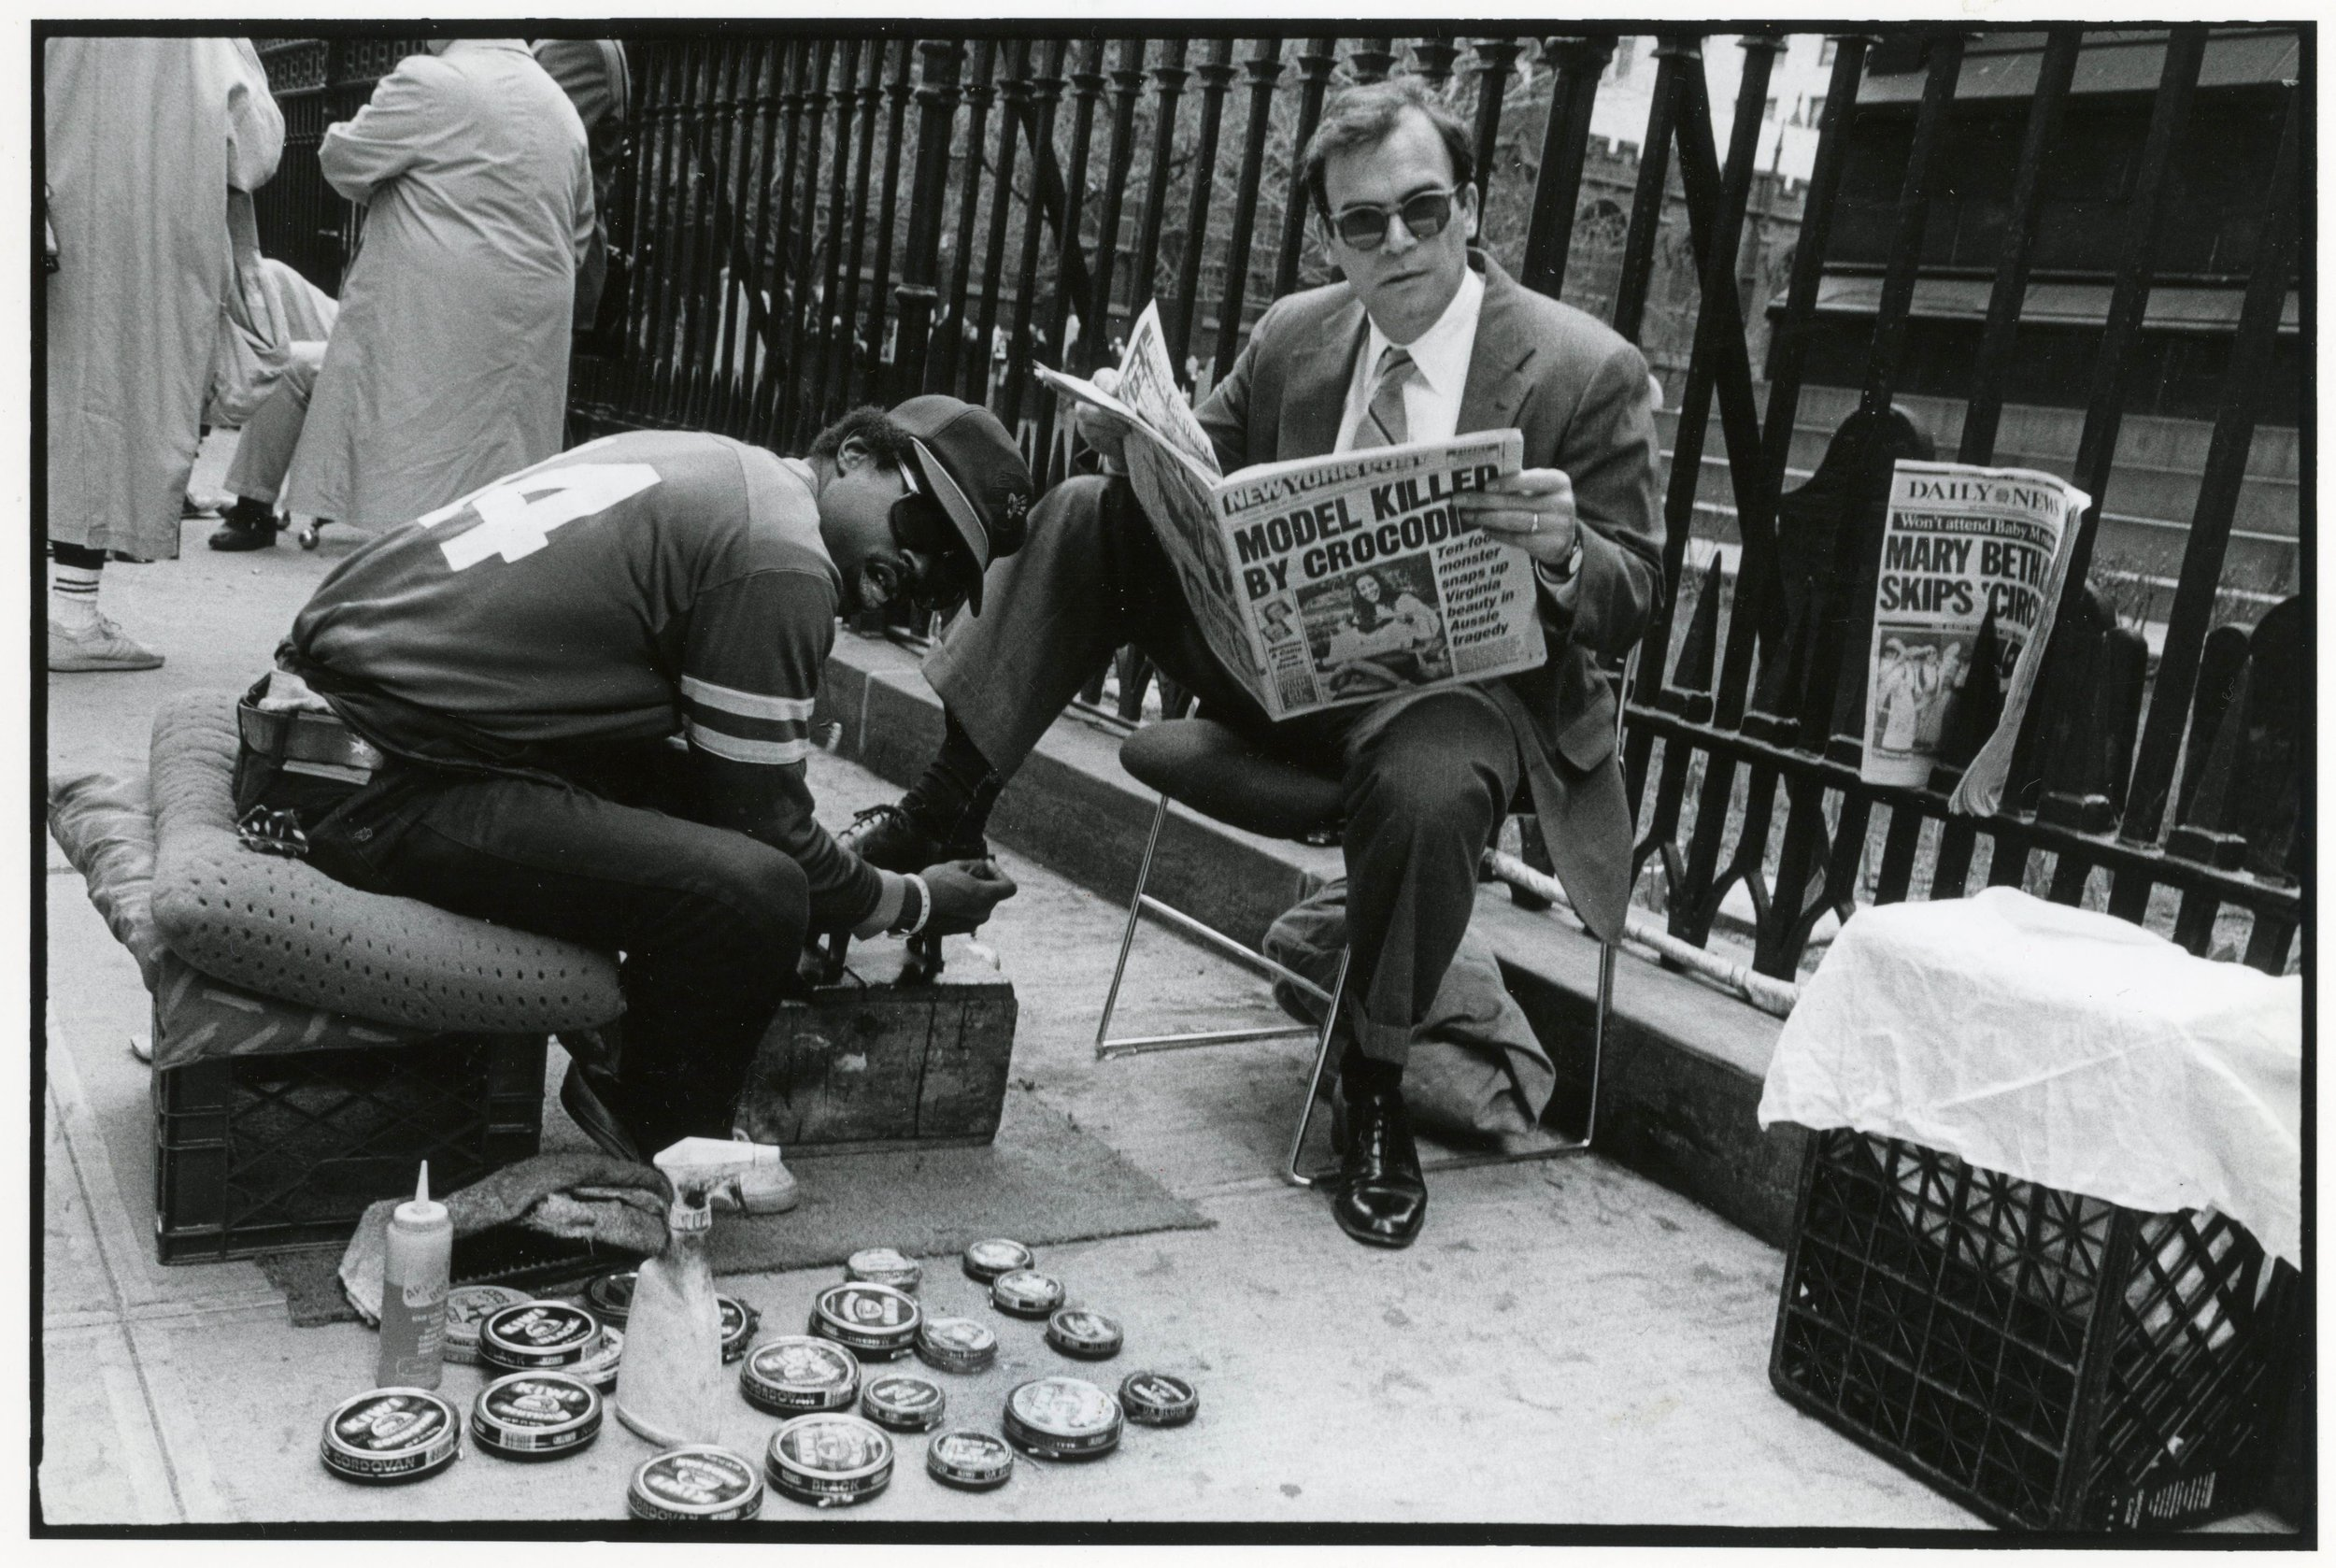 Wall Street 1980's